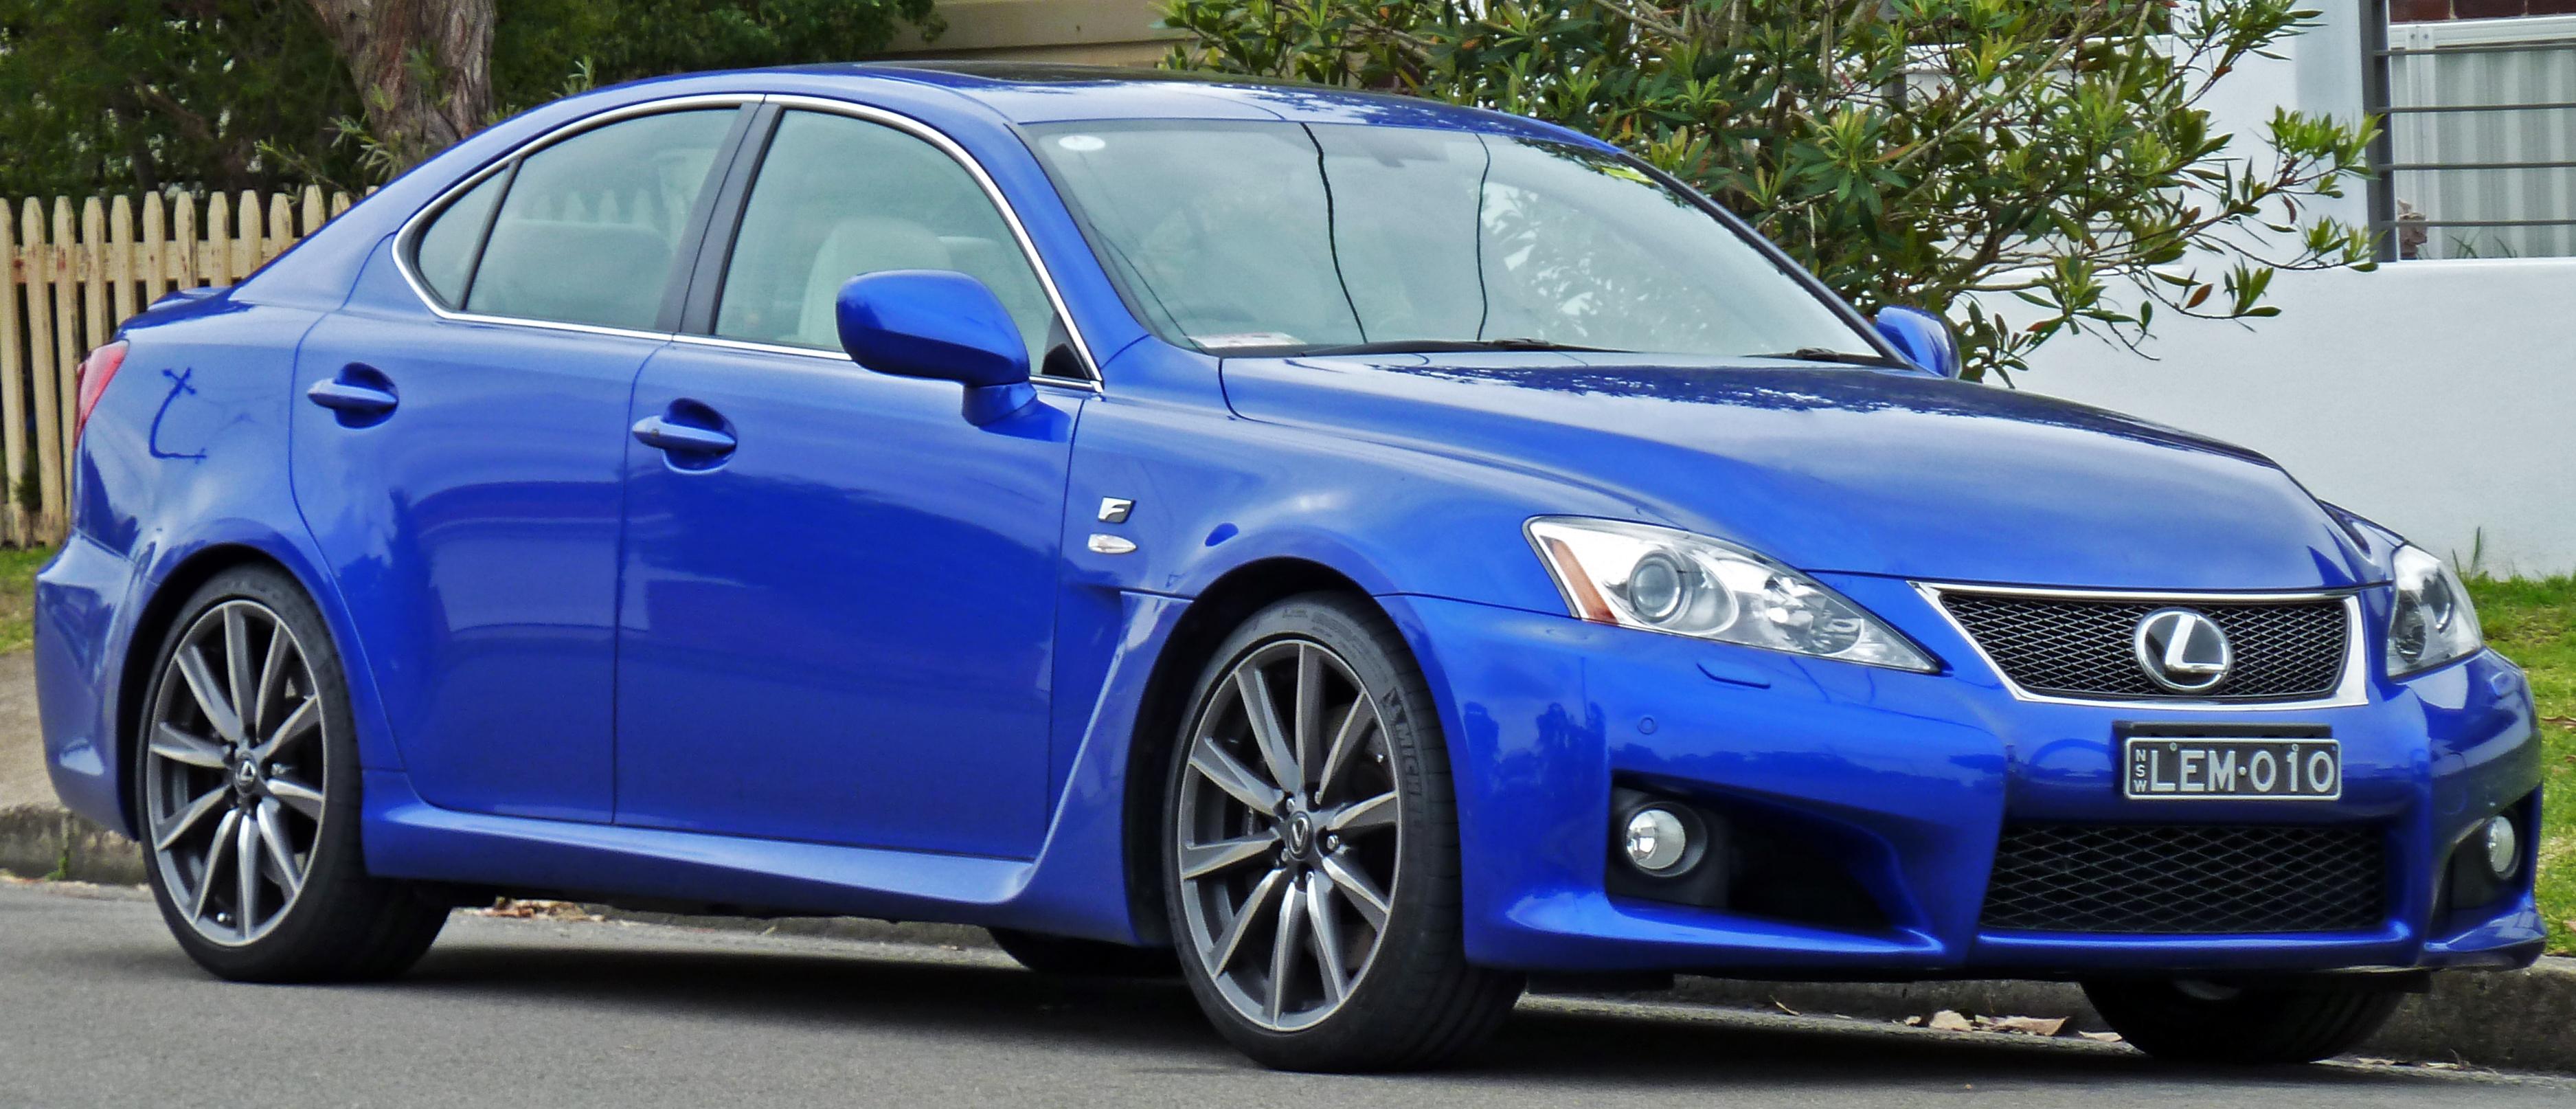 https://upload.wikimedia.org/wikipedia/commons/e/eb/2008-2010_Lexus_IS_F_%28USE20R%29_Sports_Luxury_sedan_01.jpg